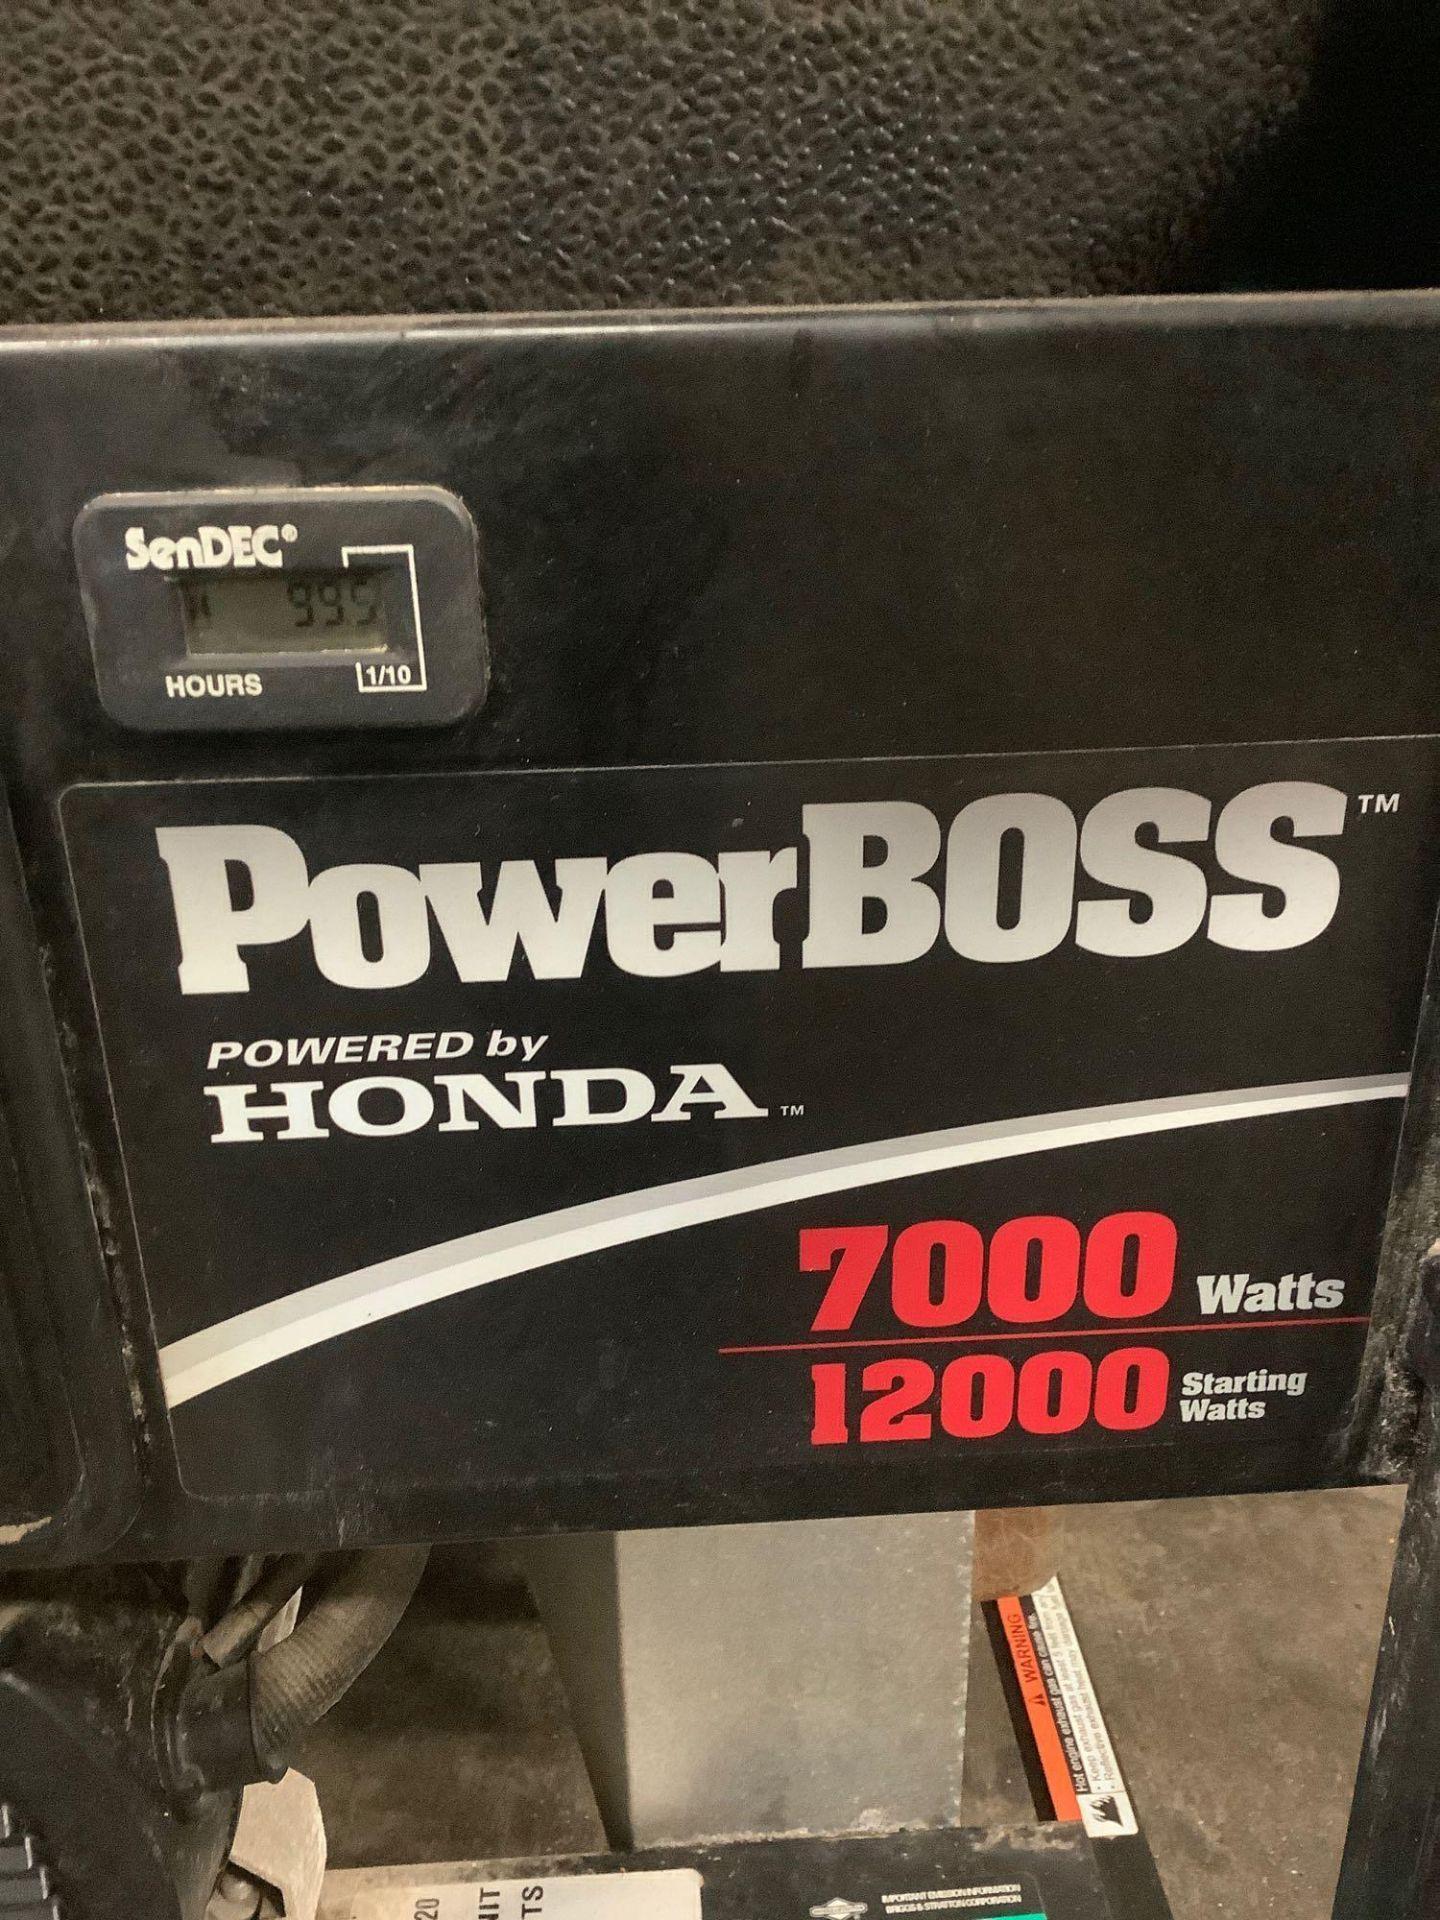 Power Boss Generator Model F030220 - Image 3 of 3